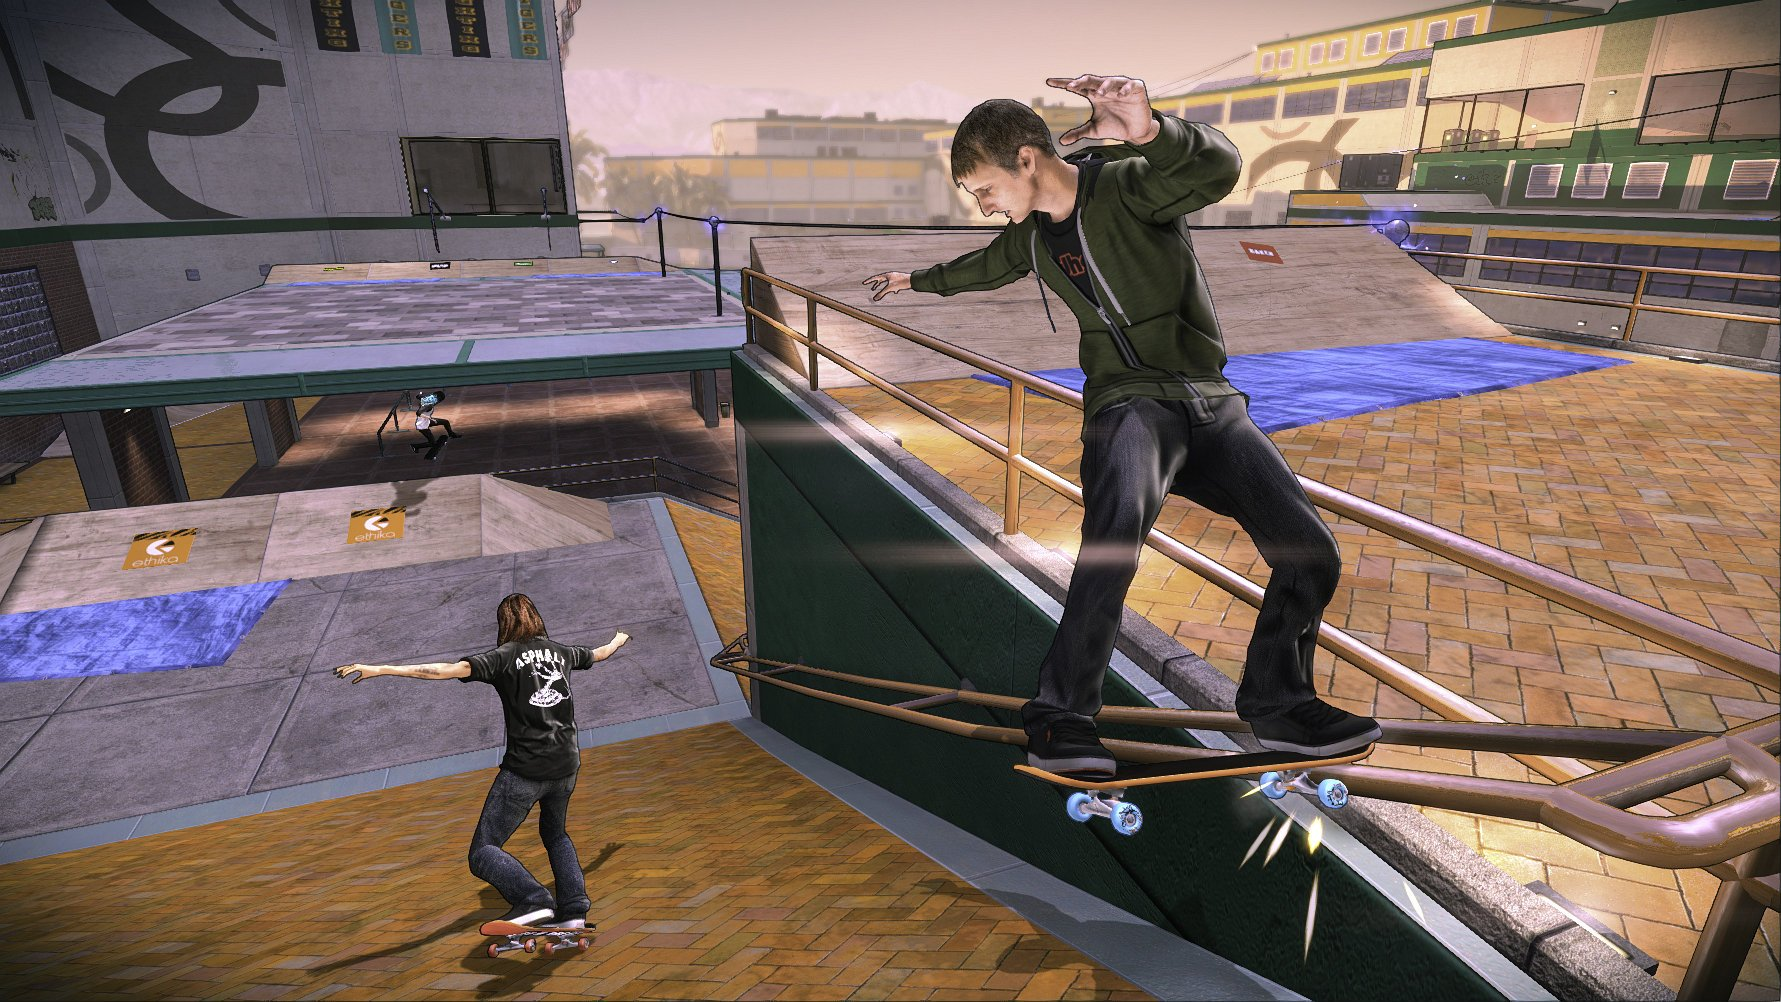 tony_hawk_s_pro_skater_5-3163238.jpg